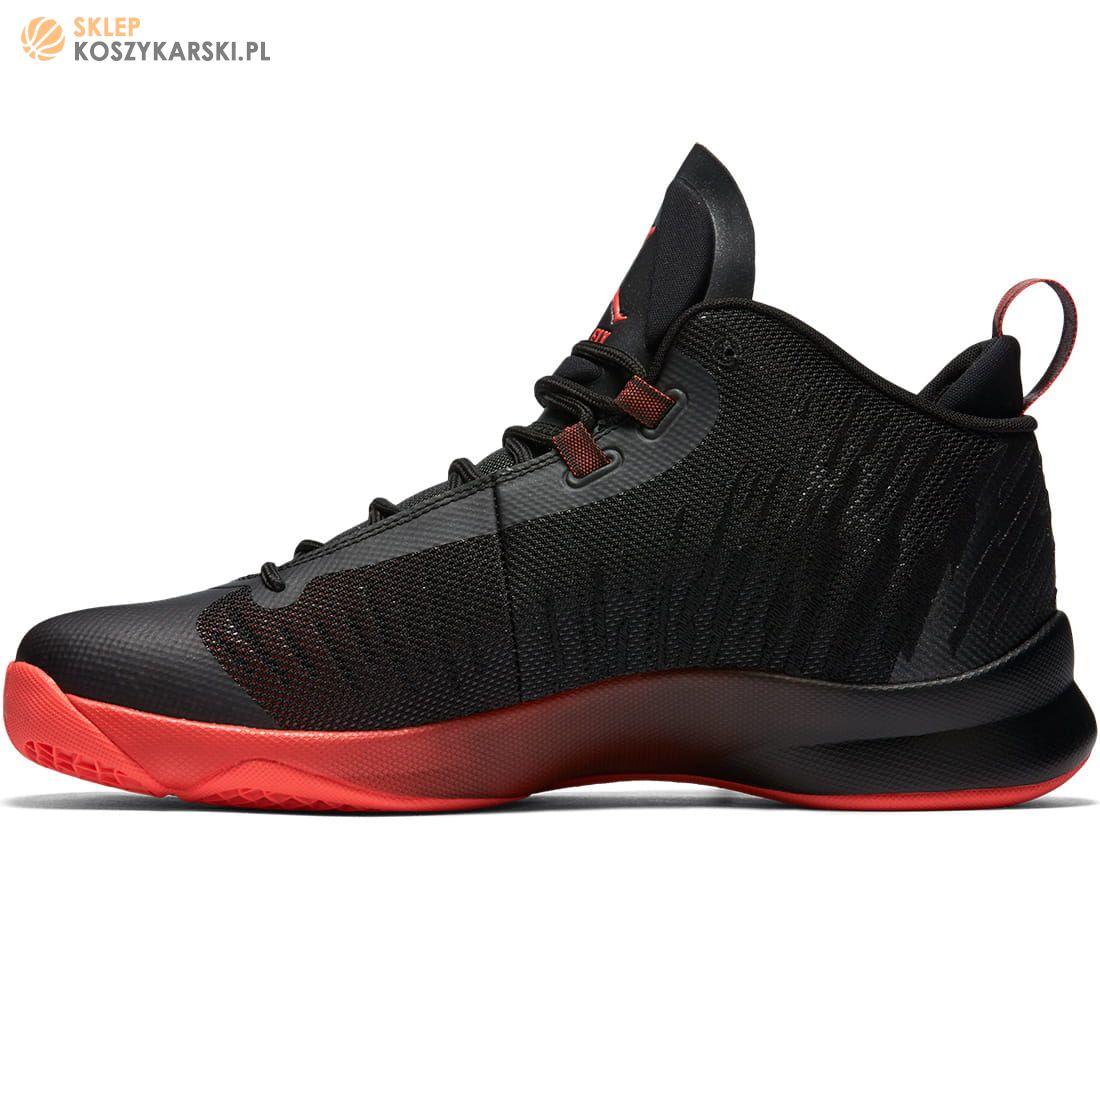 Buty koszykarskie Jordan Super.Fly 5 (844677 003)